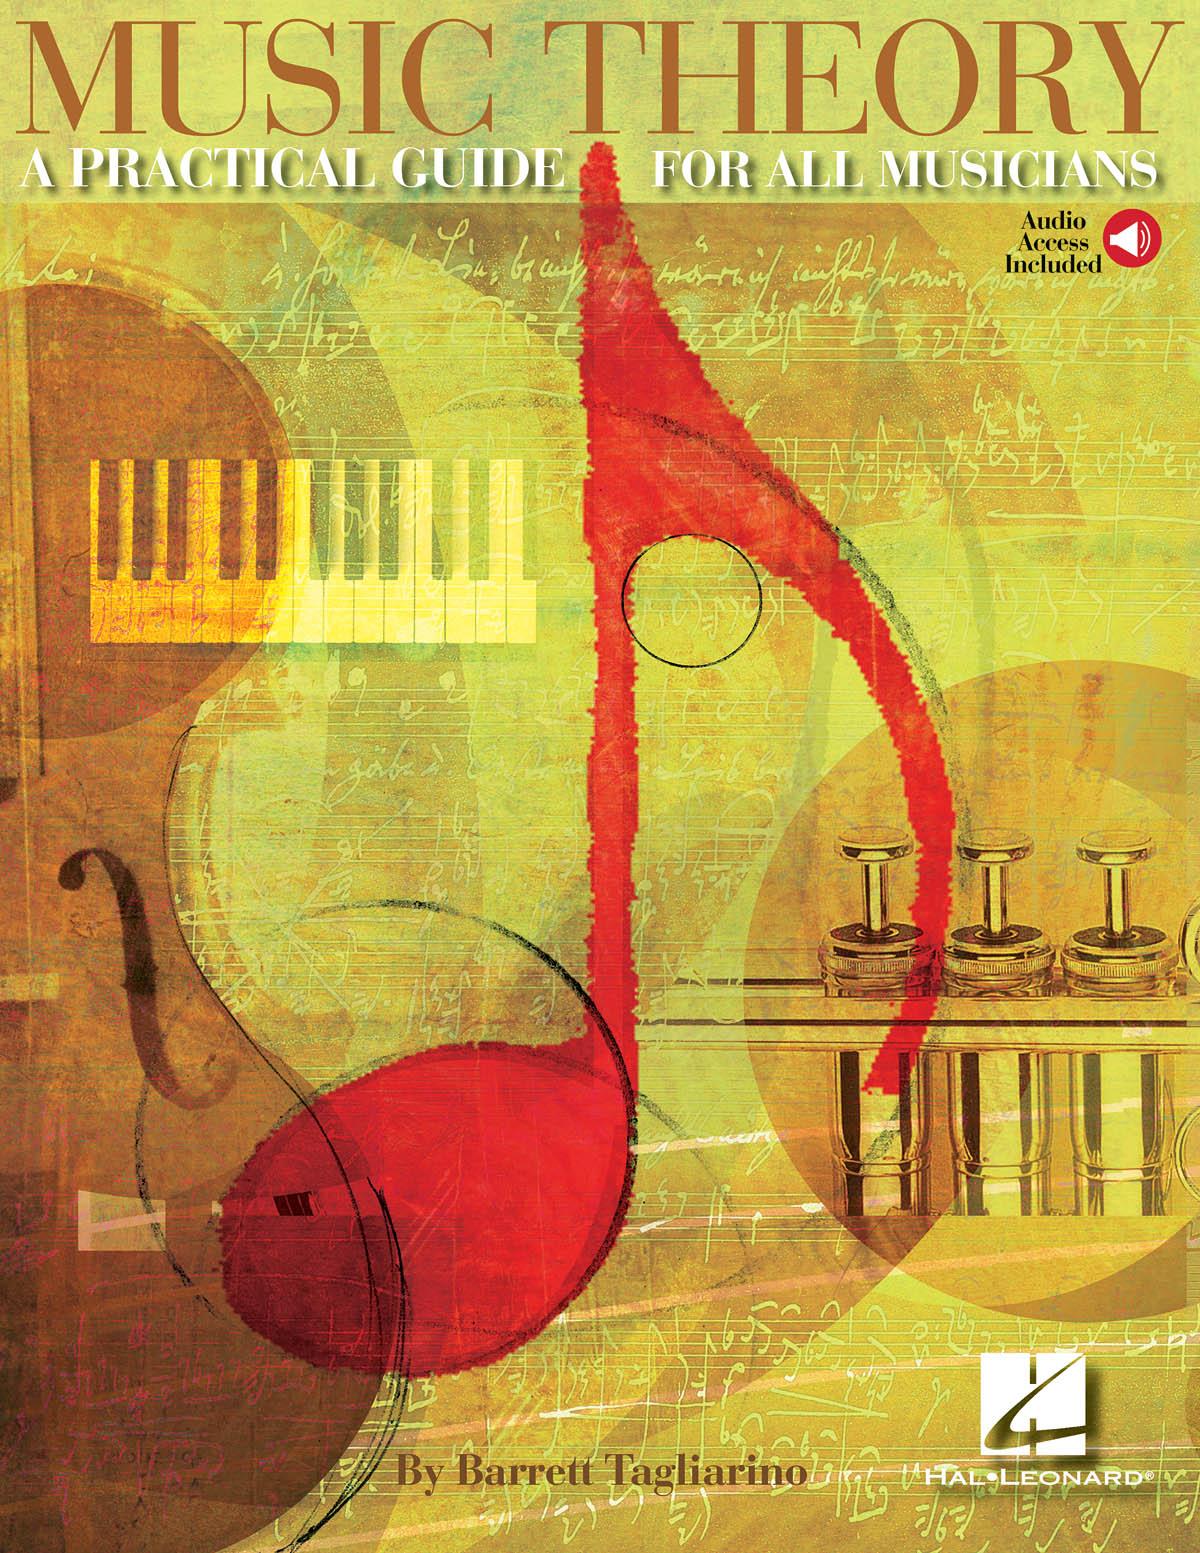 Music Theory: Reference Books: Theory